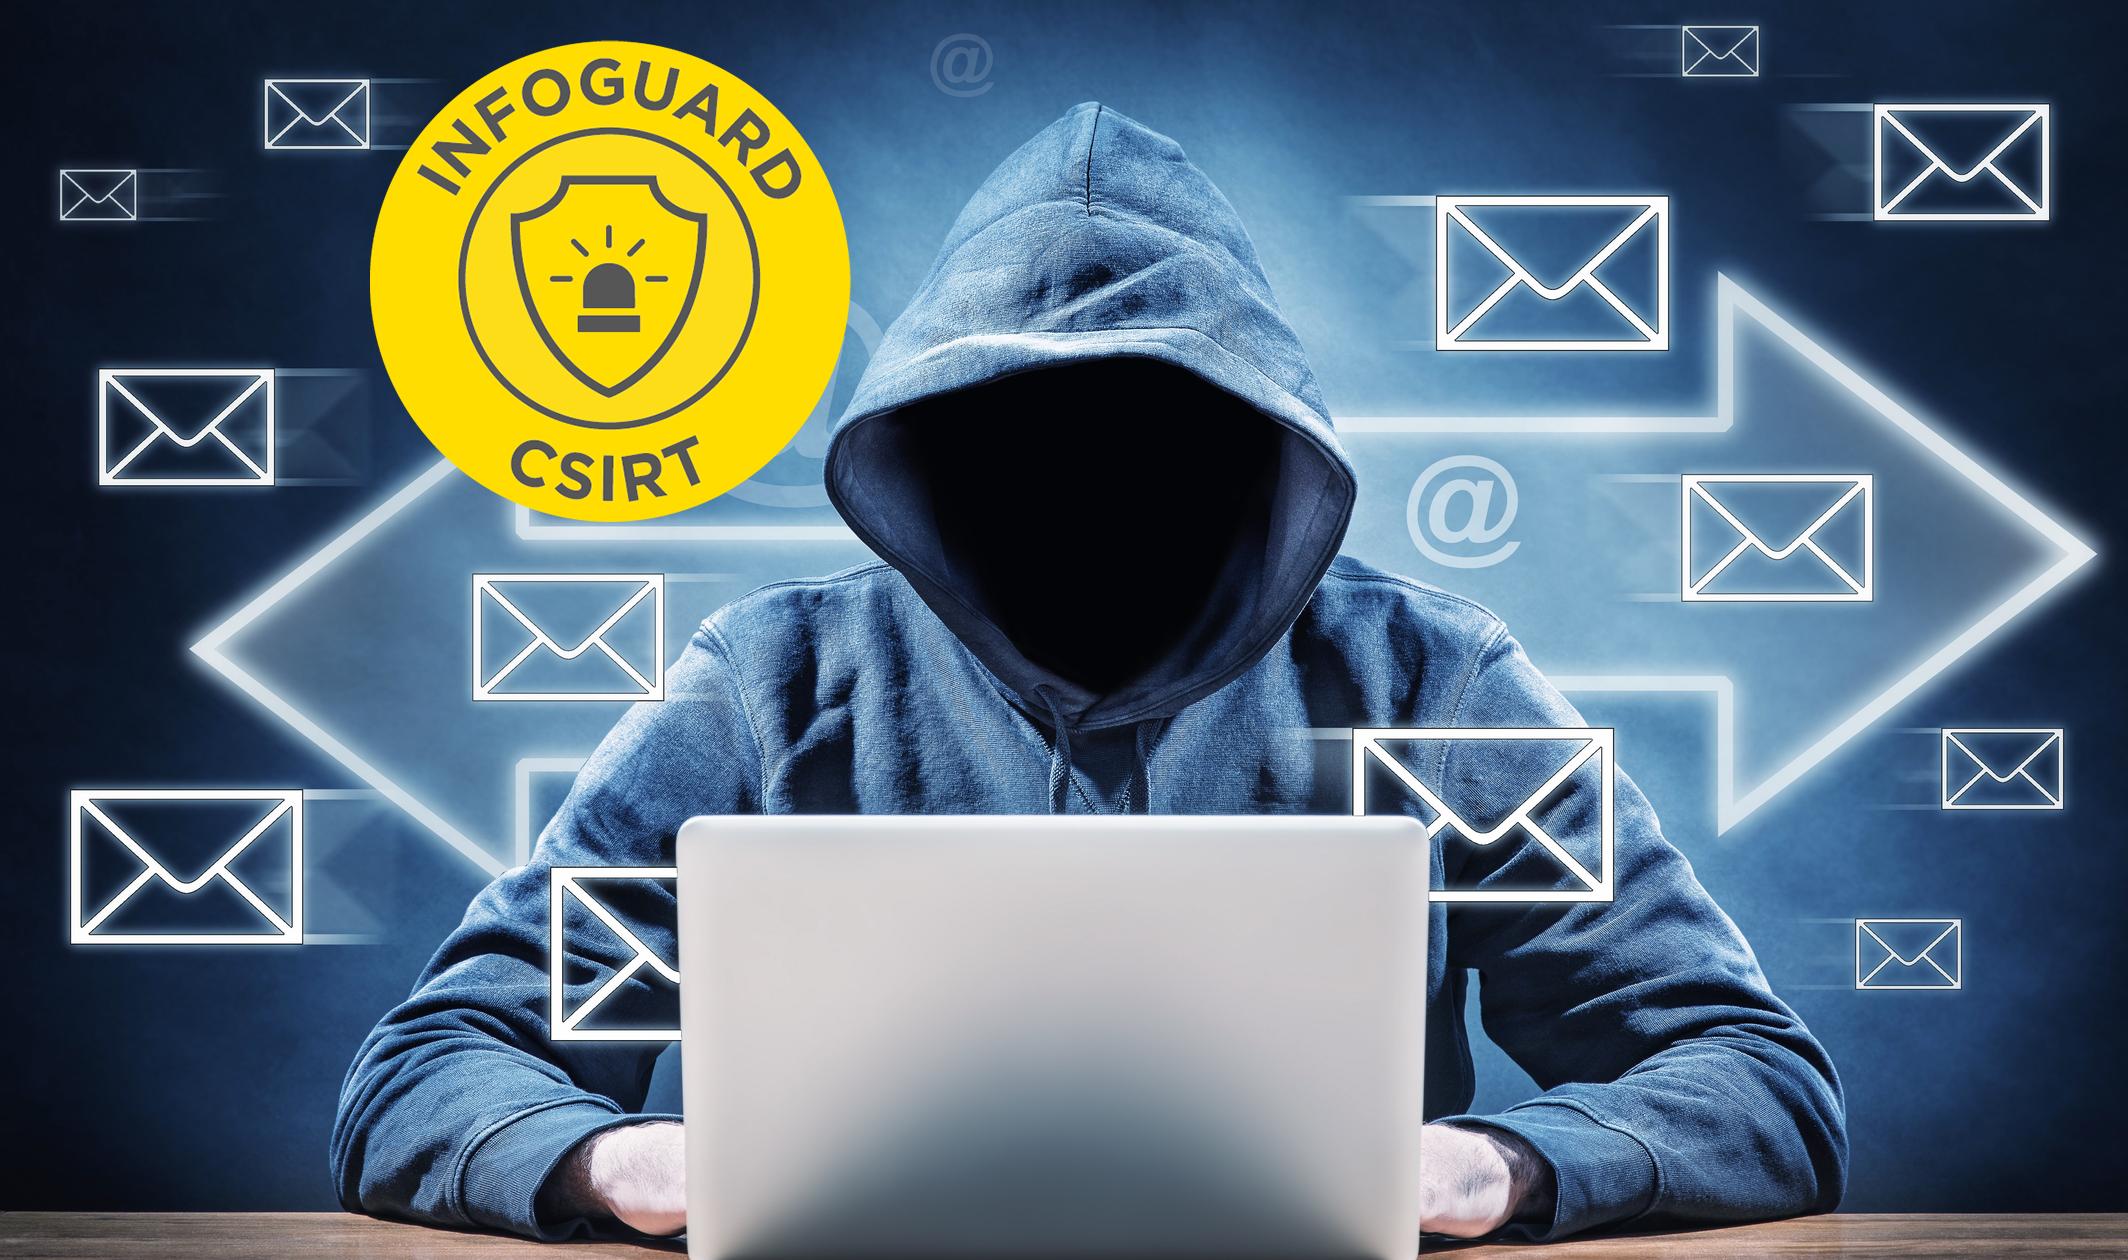 infoguard-blog-ransomware-pakettrick